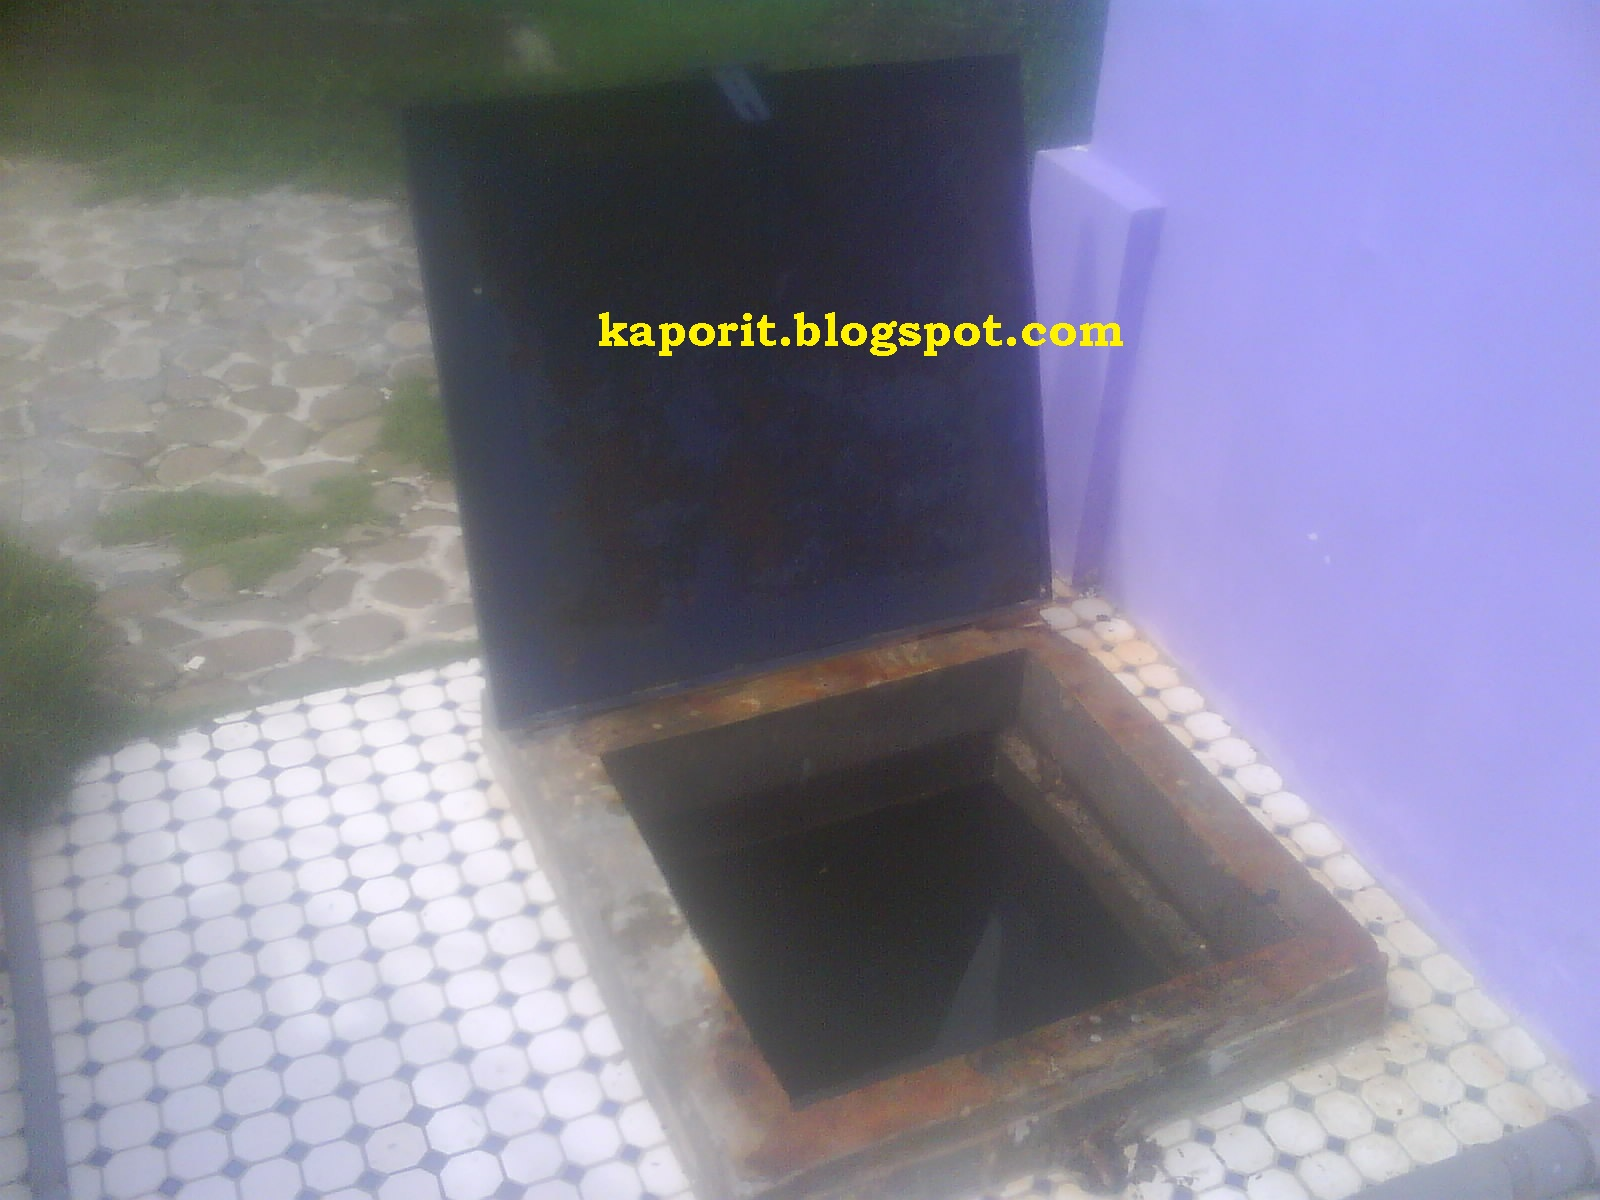 2012 Pool Maintenance Klorinator Tempat Melarutkan Kaporit Pools Balancing Tank Design